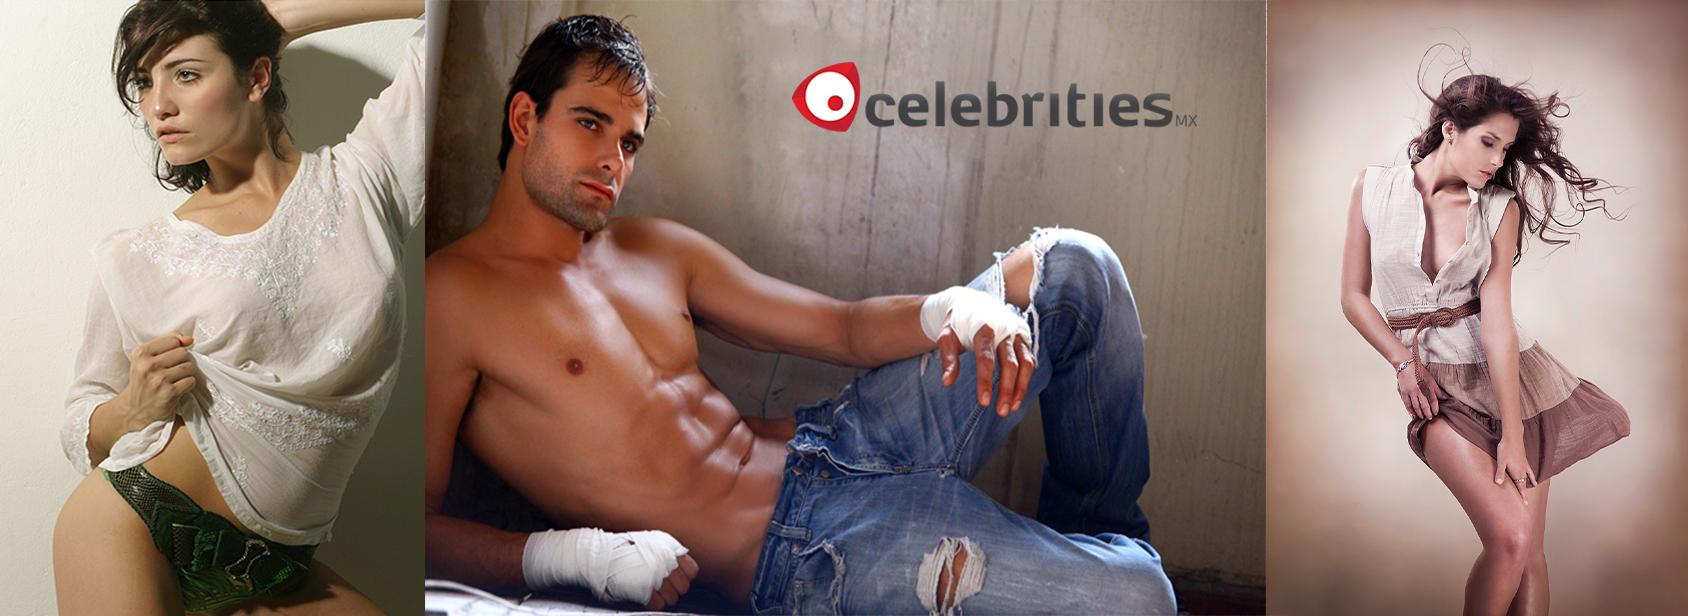 Celebrities-agencia-modelaje-slider-1